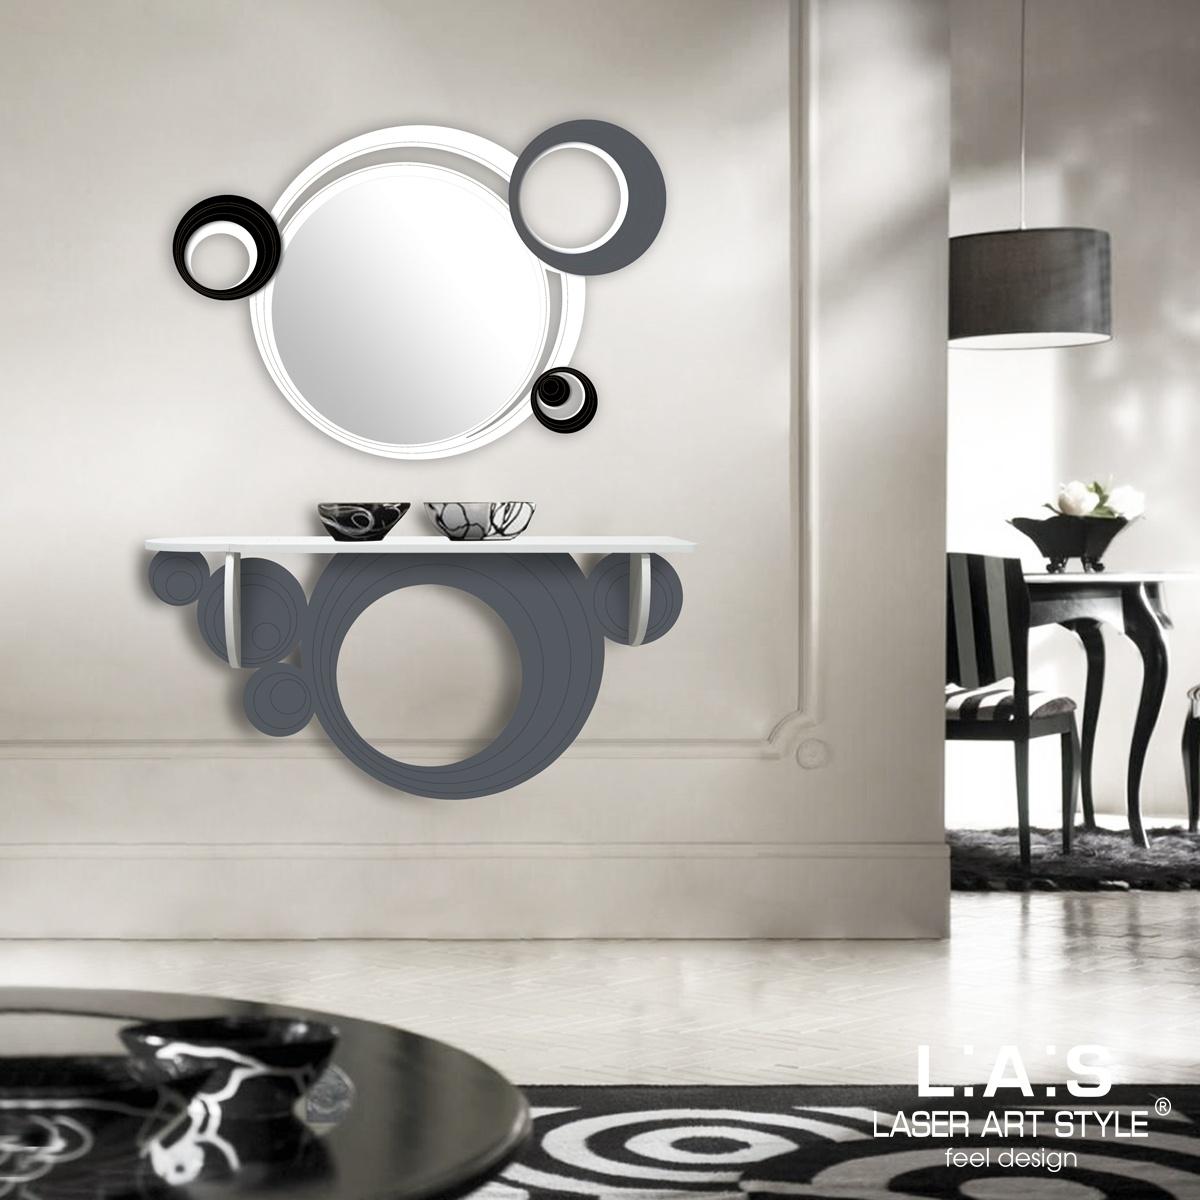 L:A:S - Laser Art Style - CONSOLLE INGRESSO DESIGN MODERNO – SI-279 BIANCO – ANTRACITE